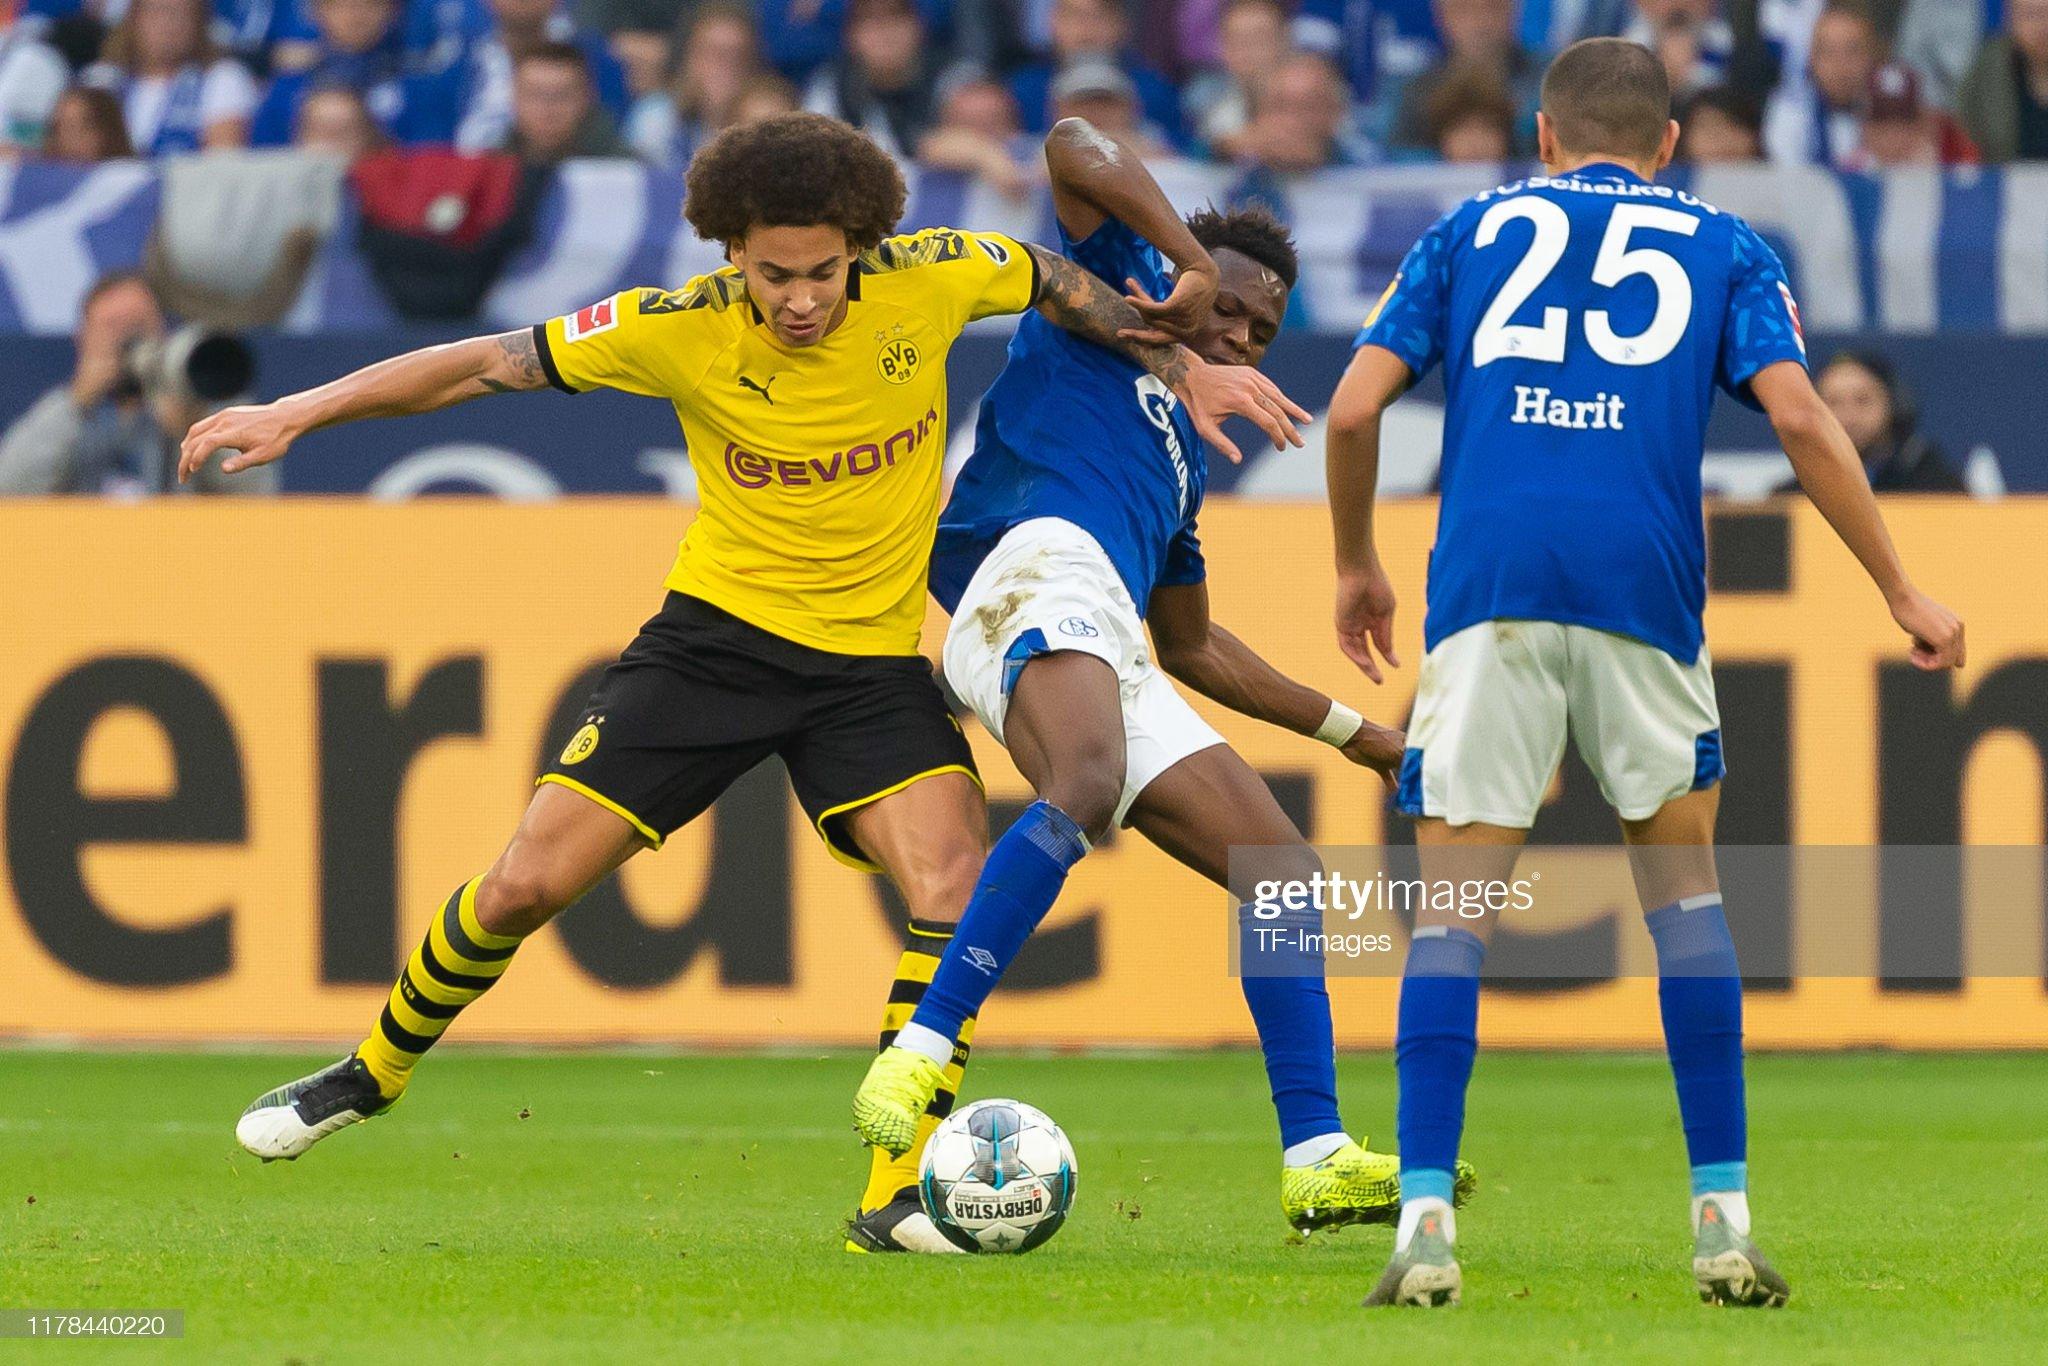 Dortmund v Schalke Preview, prediction and odds